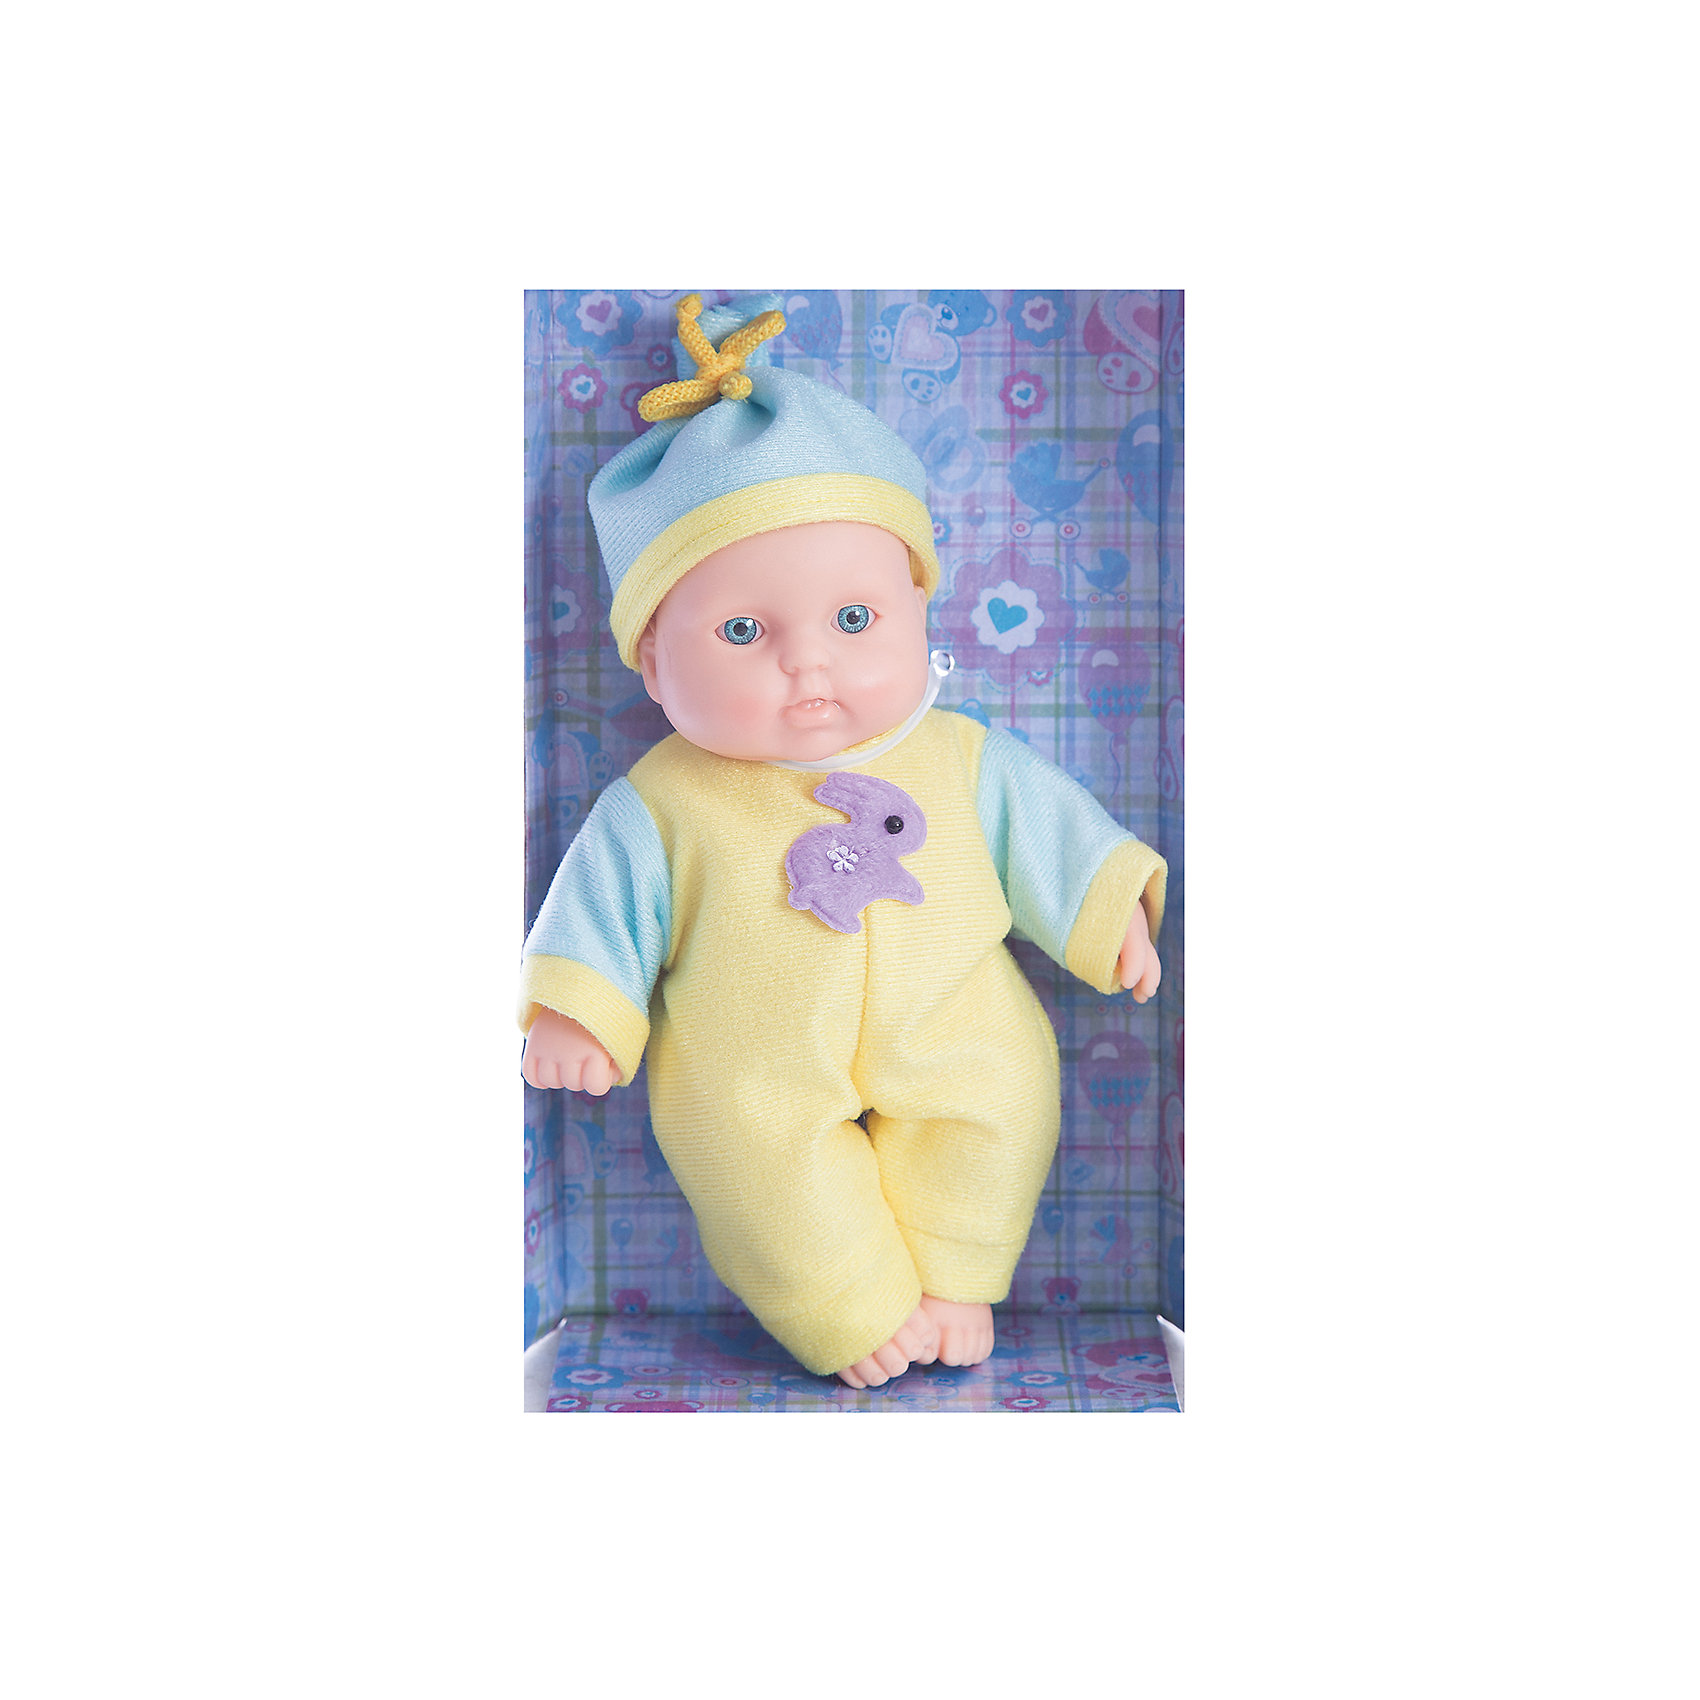 Весна Кукла Карапуз 10 (мальчик), 20 см, Весна весна 35 см